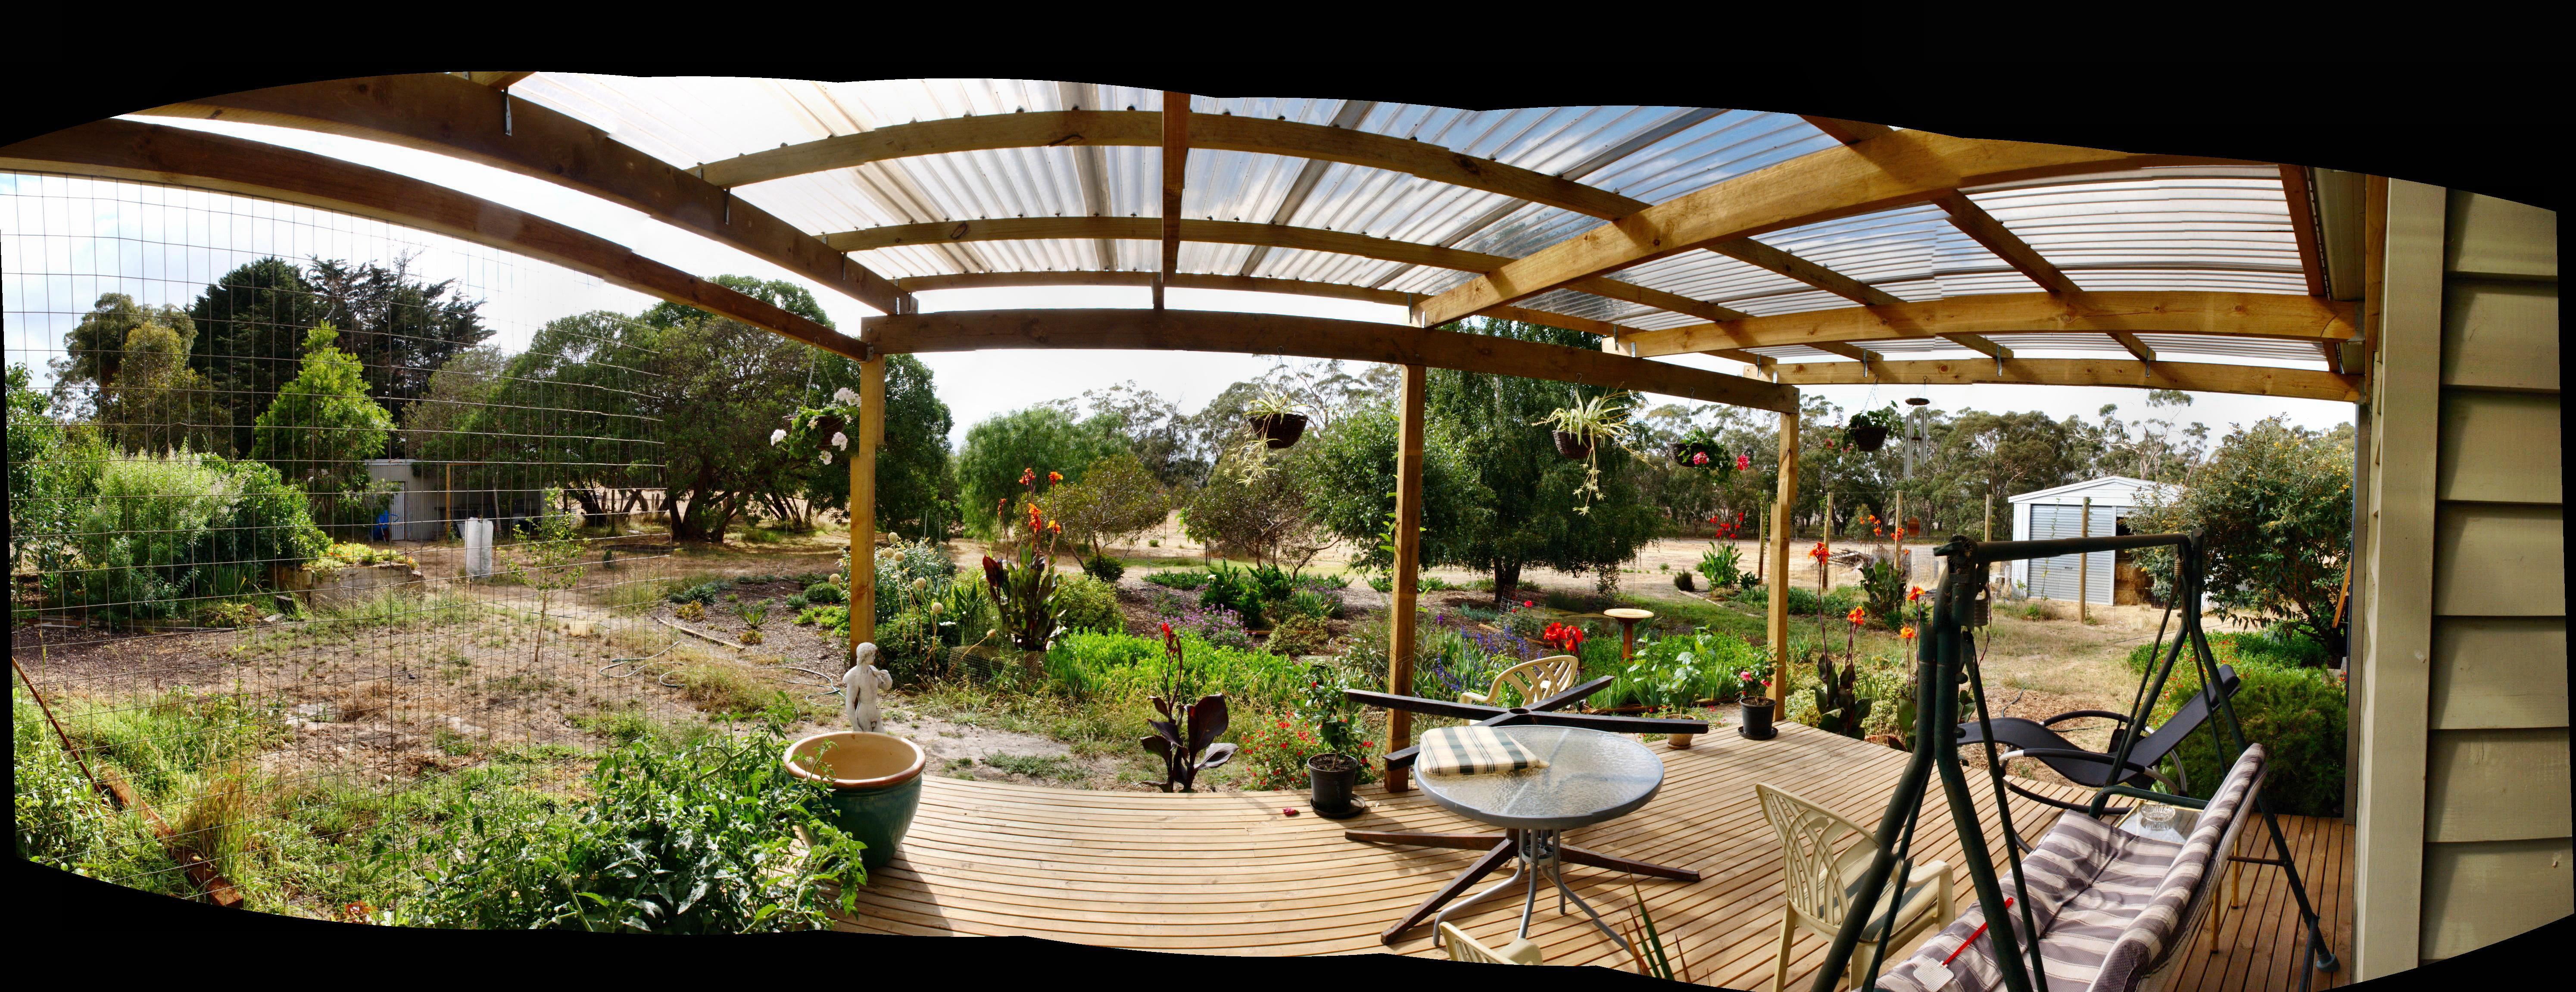 verandah-panorama-uncropped.jpeg